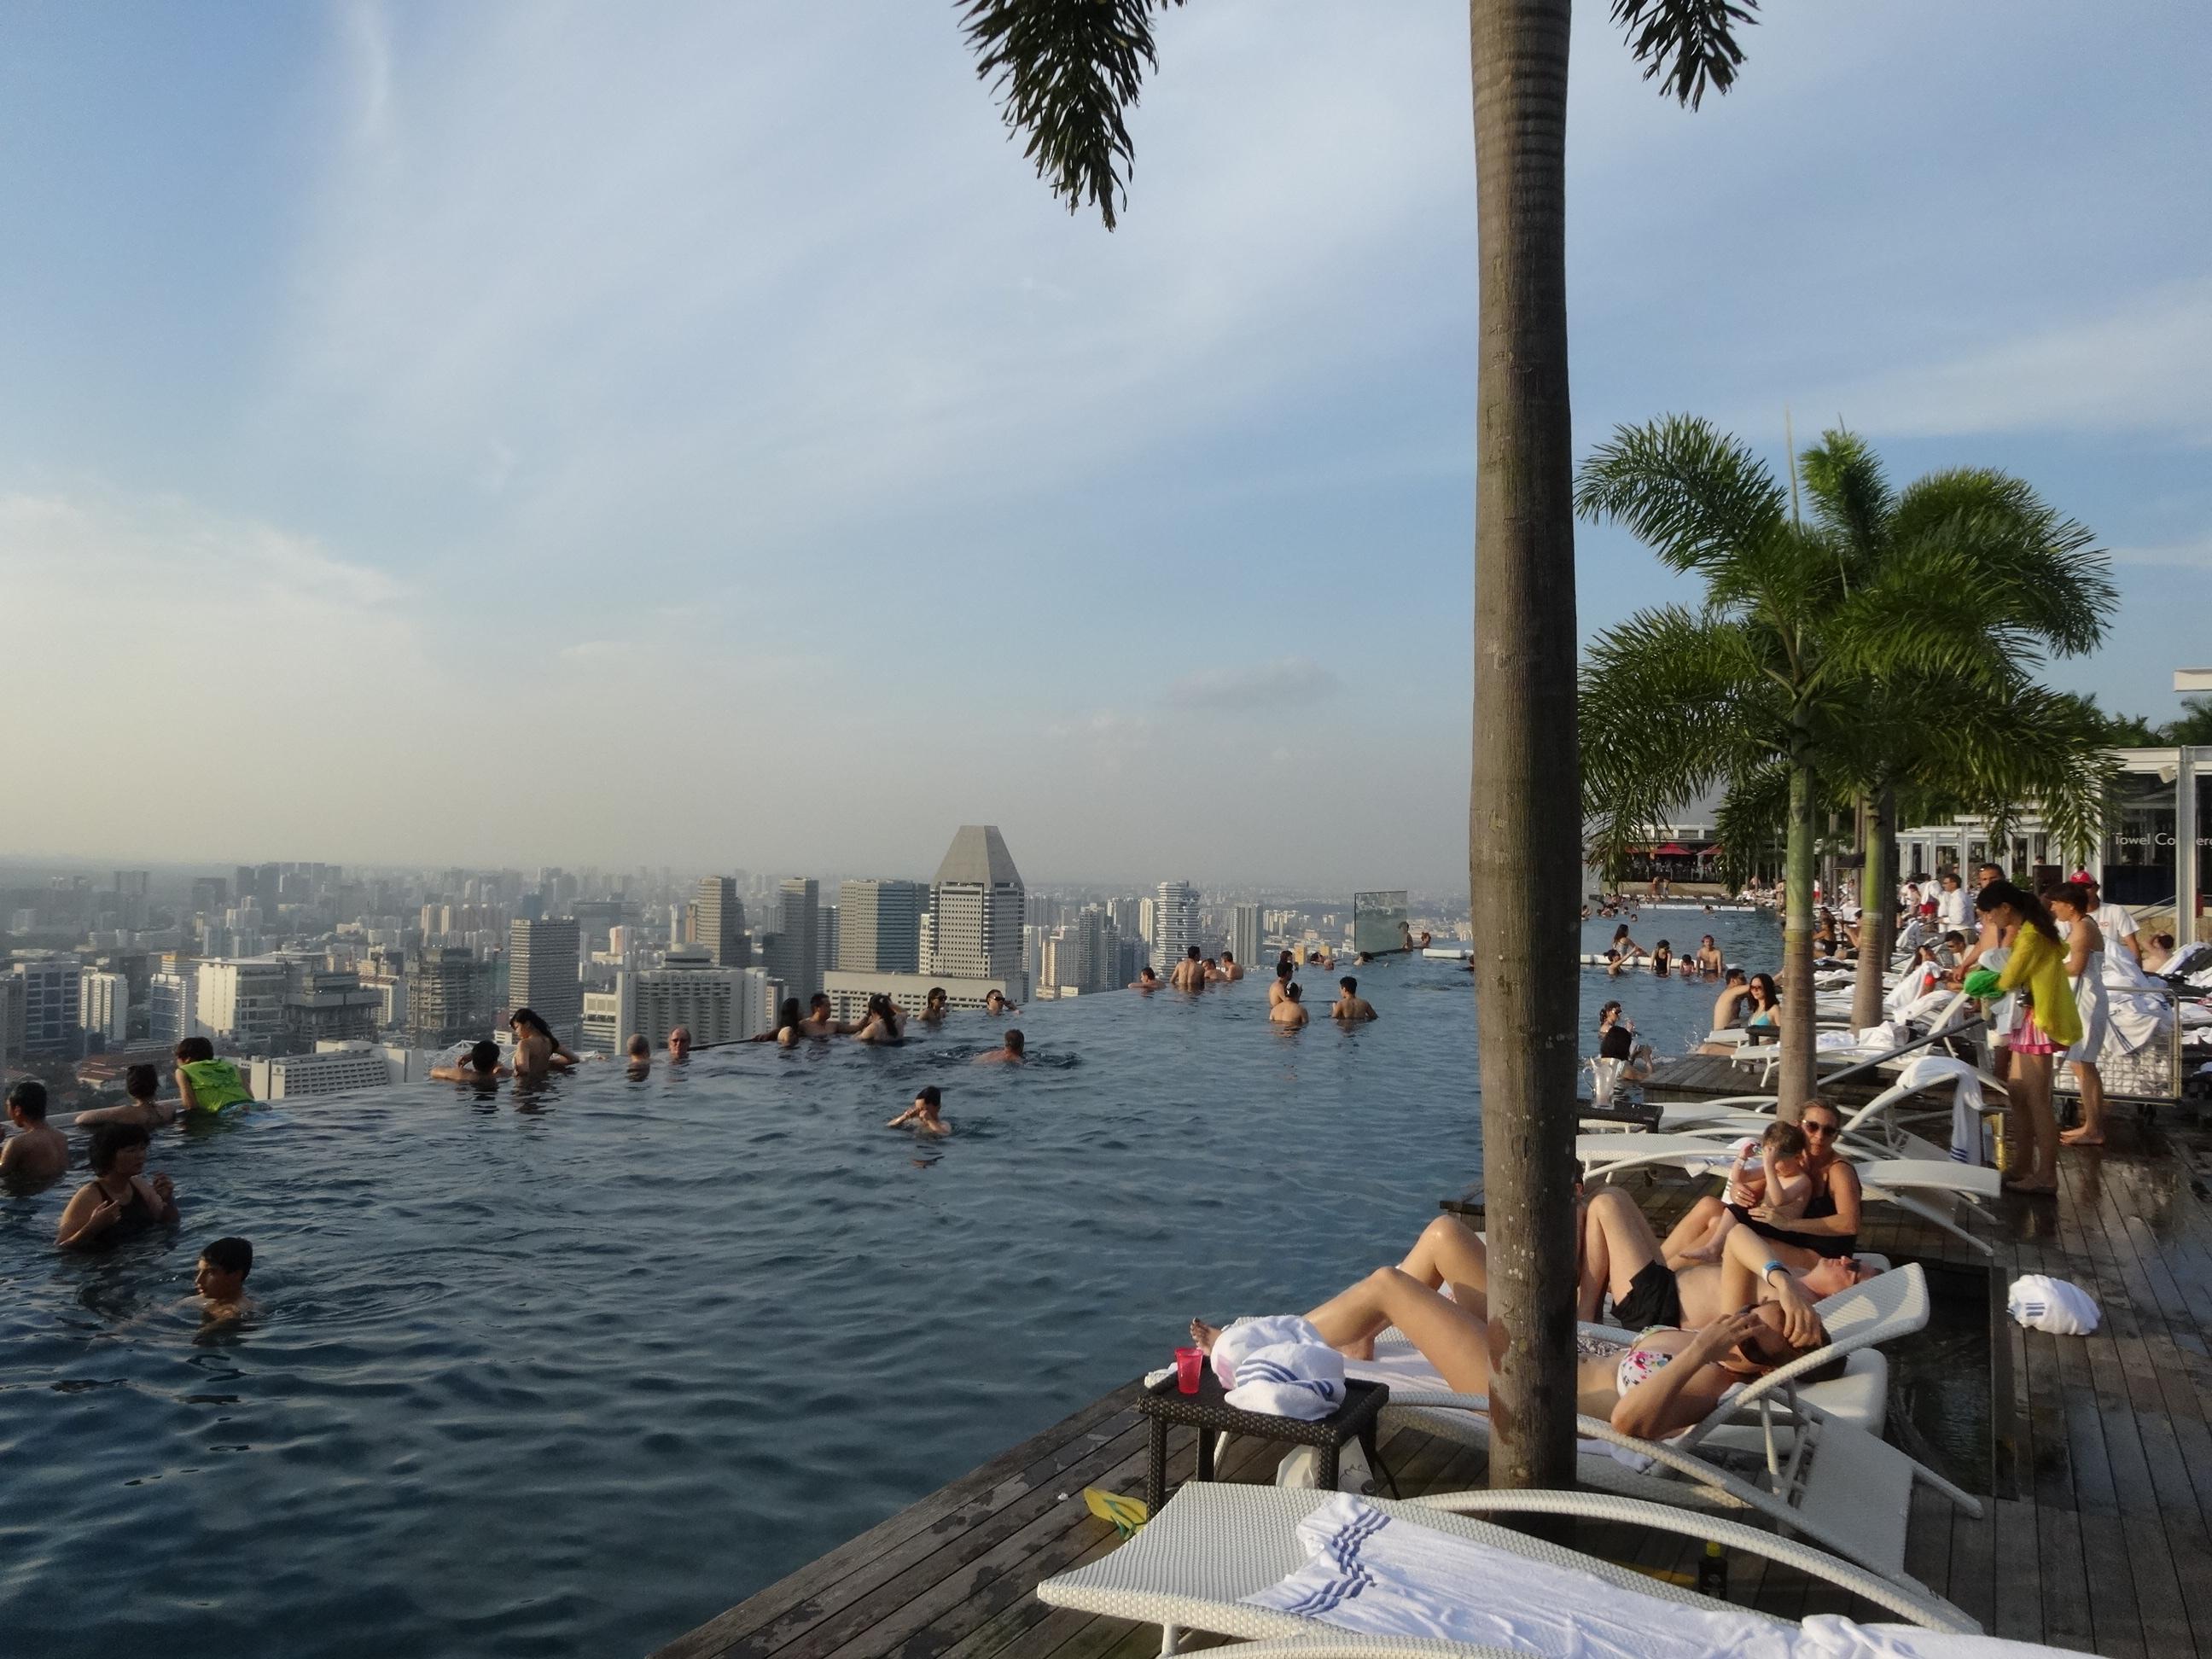 Marina bay sands pr ximos destinos - Ingresso piscina marina bay sands ...